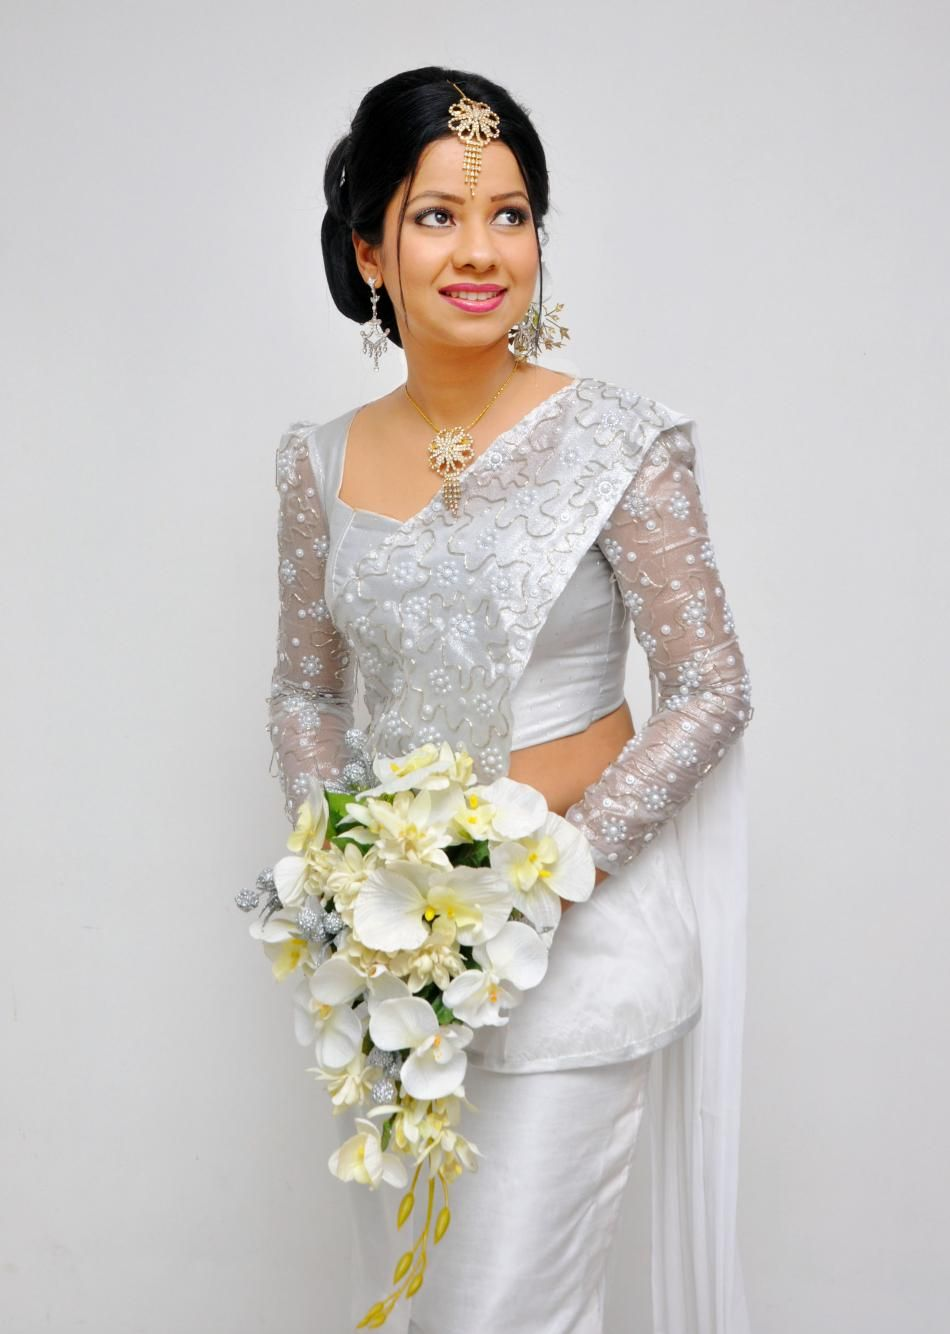 Sri Lankan bride | The Sri Lankan bride | Pinterest | Wedding